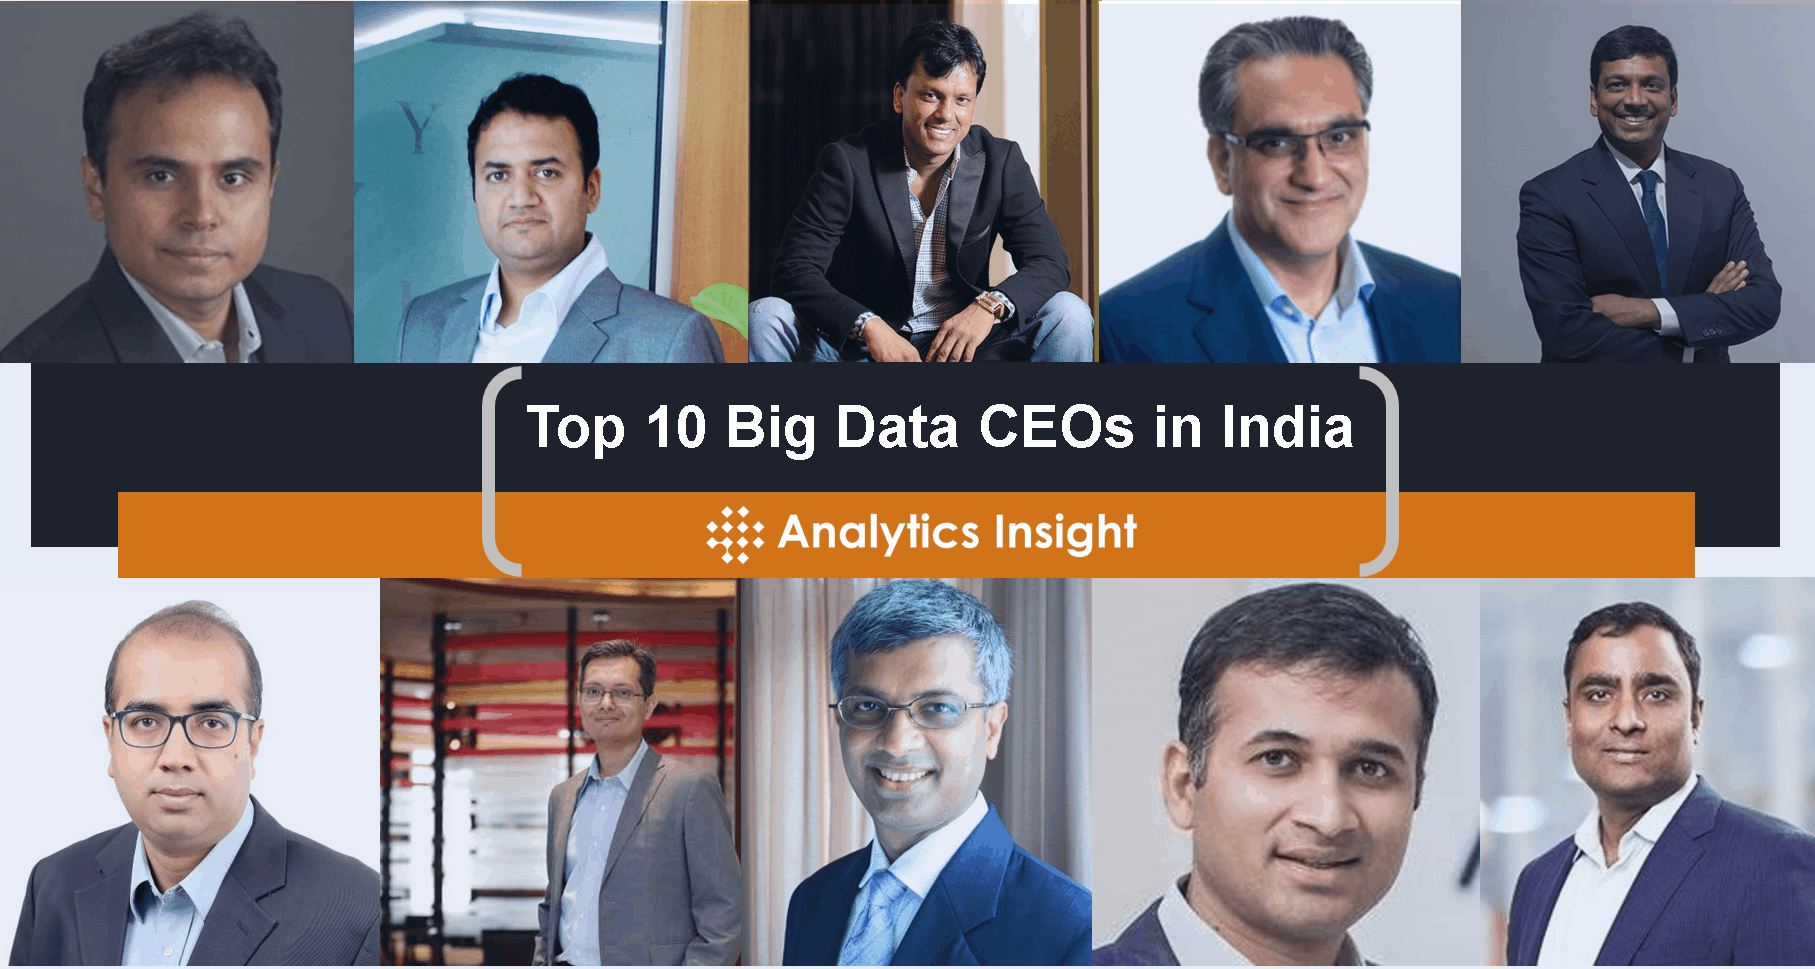 Top 10 Big Data CEOs in India